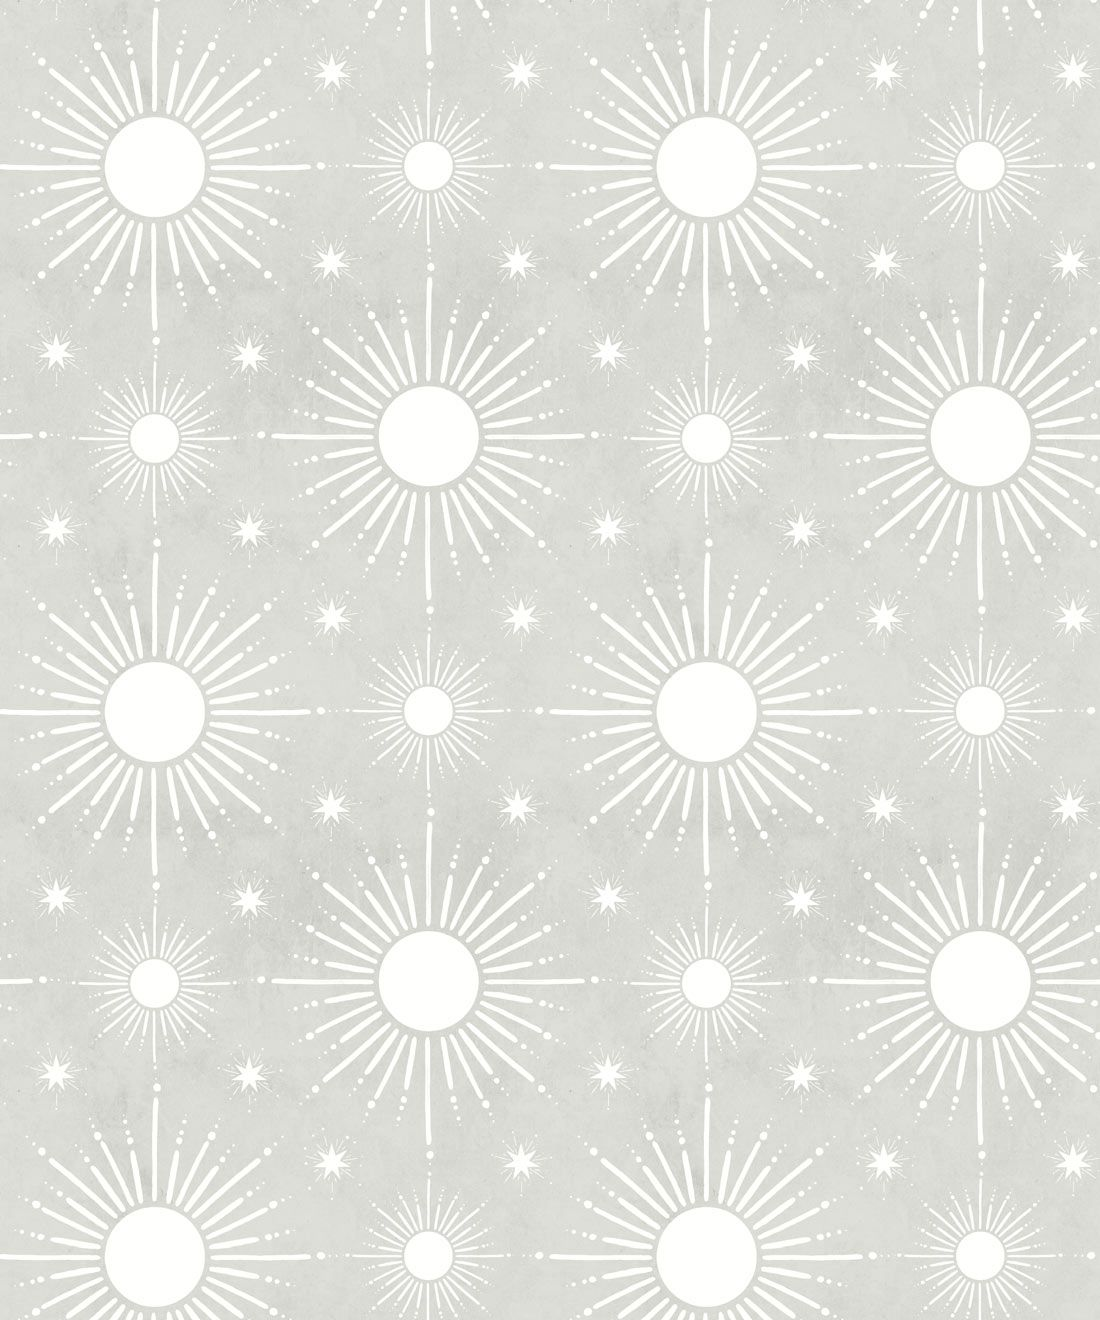 Sun Light Star Bright Wallpaper • Beige • Swatch